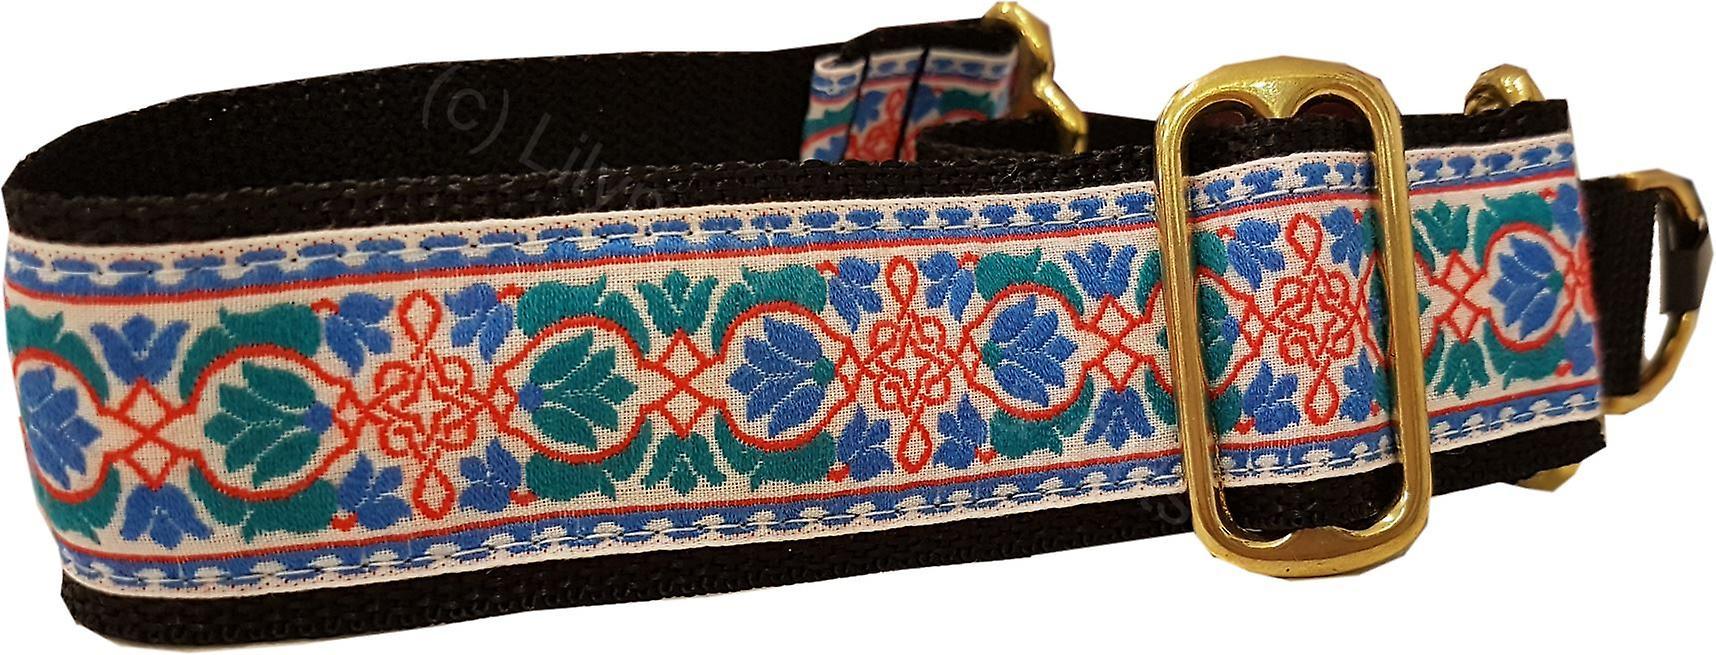 Dogcrafts 40-25mm Drop Martingale Dog Collar Red Blue Teal